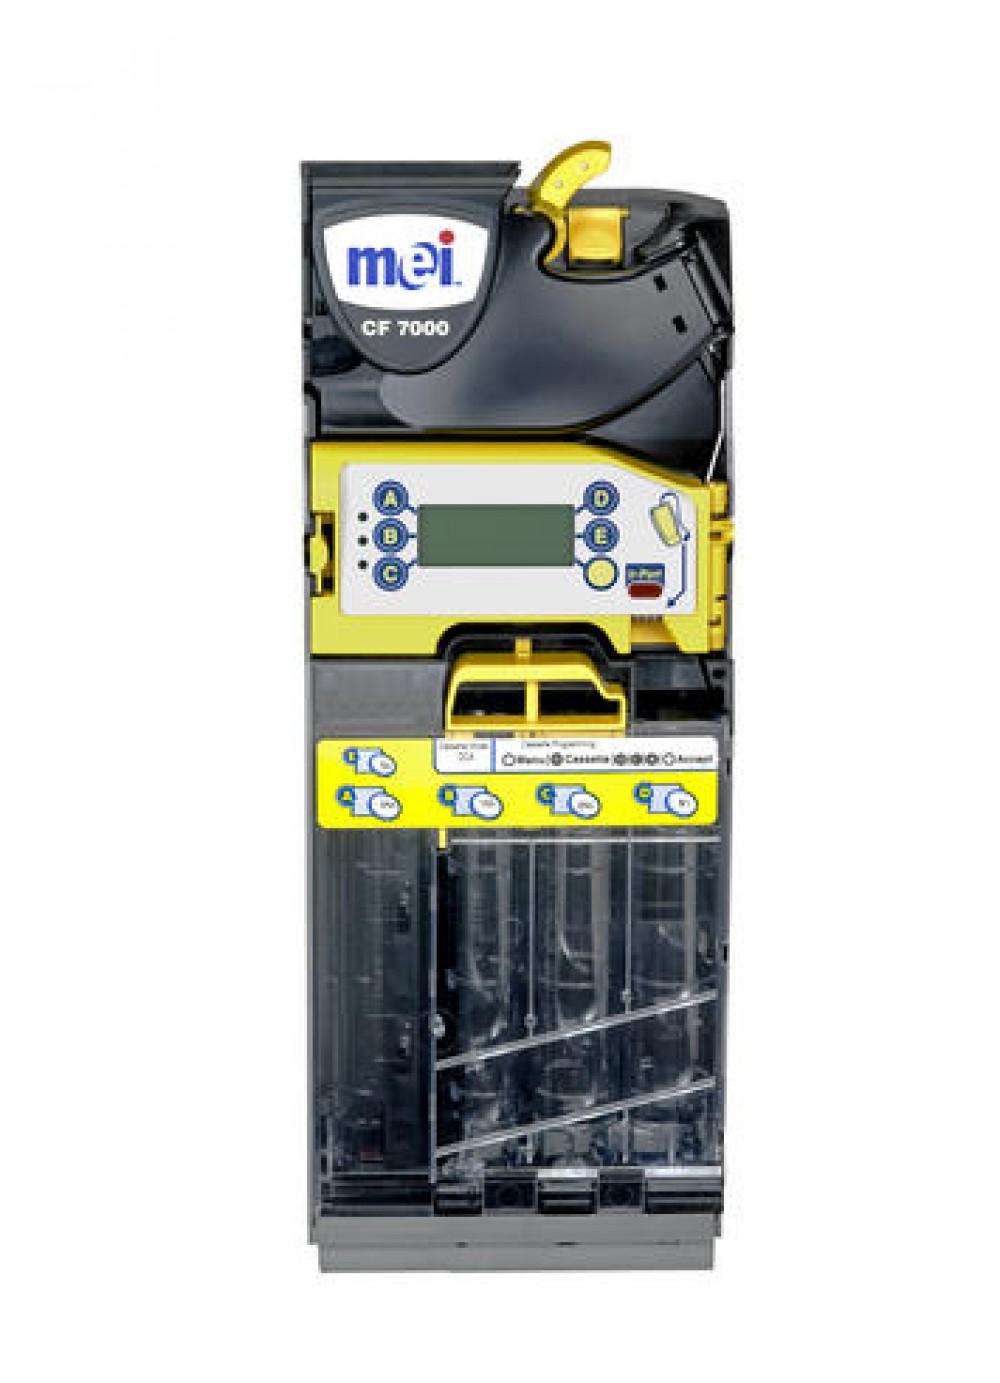 Mei cashflow® series 7000 | hansab. Com.